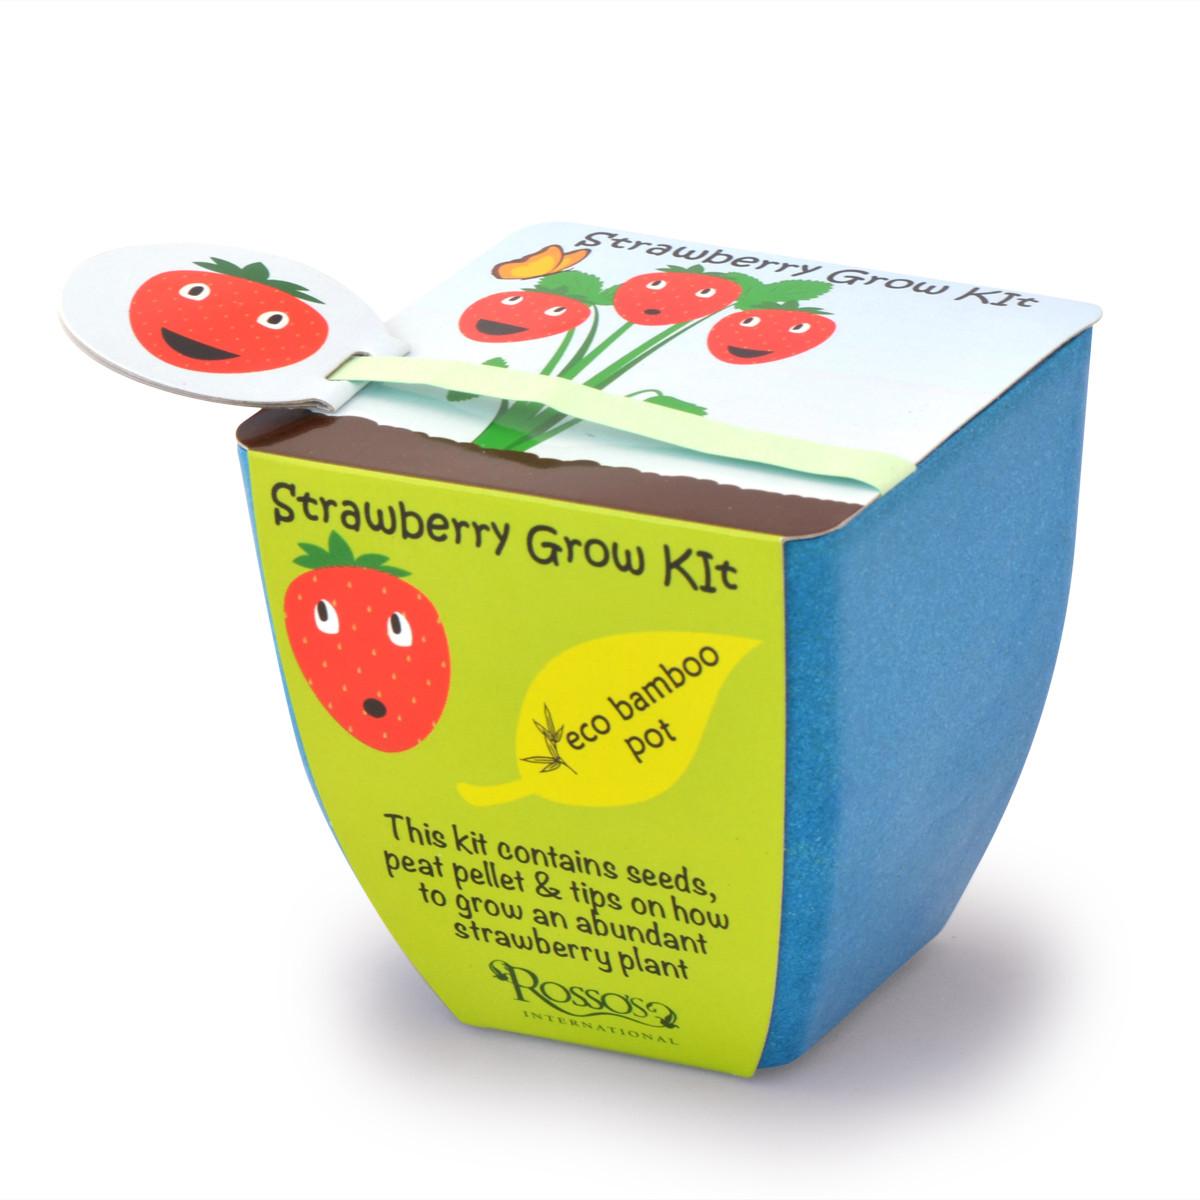 Rosso 39 s strawberry grow kit children 39 s kit for Gardening kit for toddlers